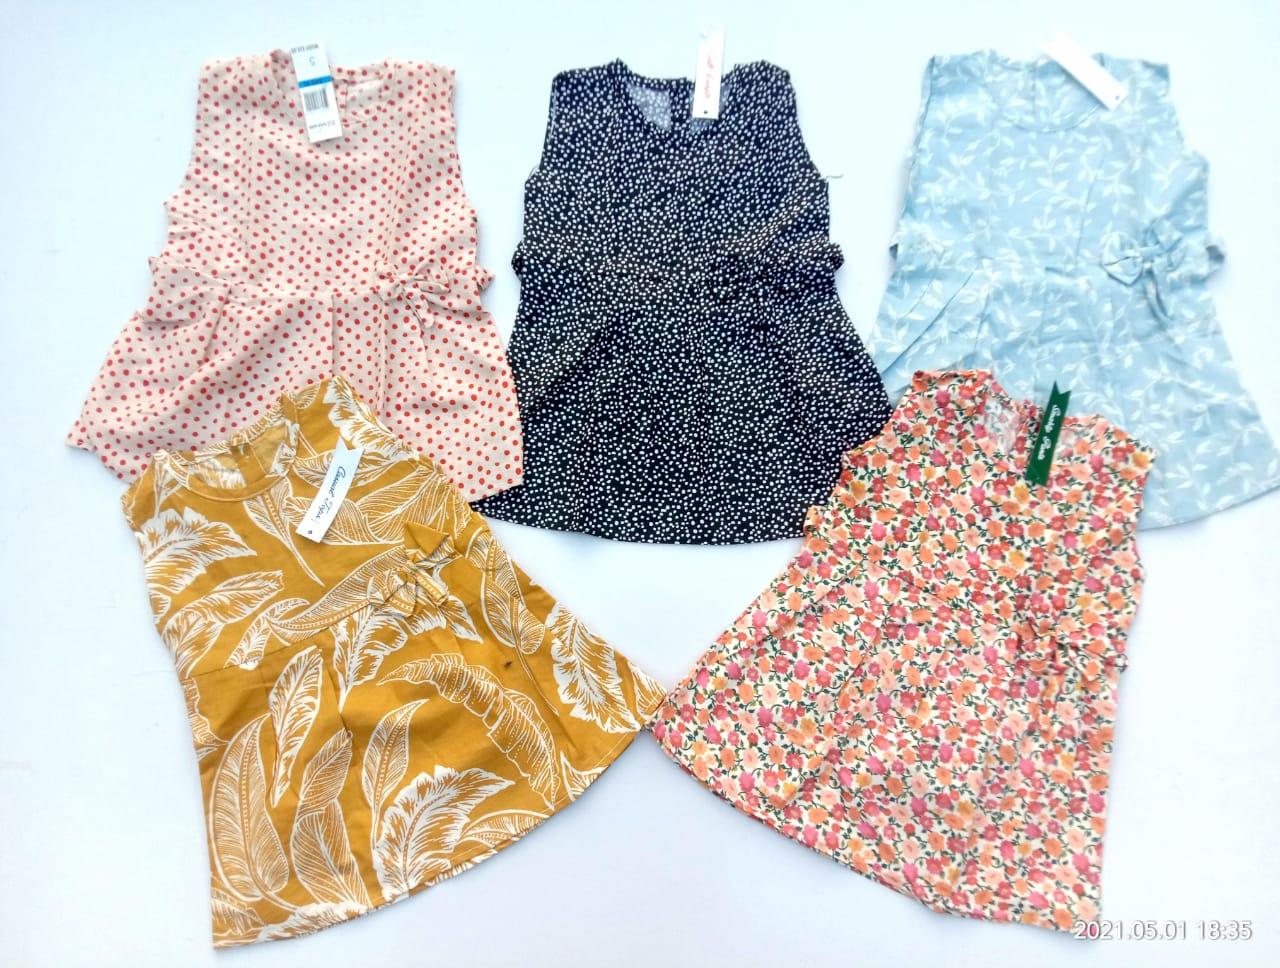 Pack Of 5 Multi-Color Printed Cotton Frock For Girls (Random Design)